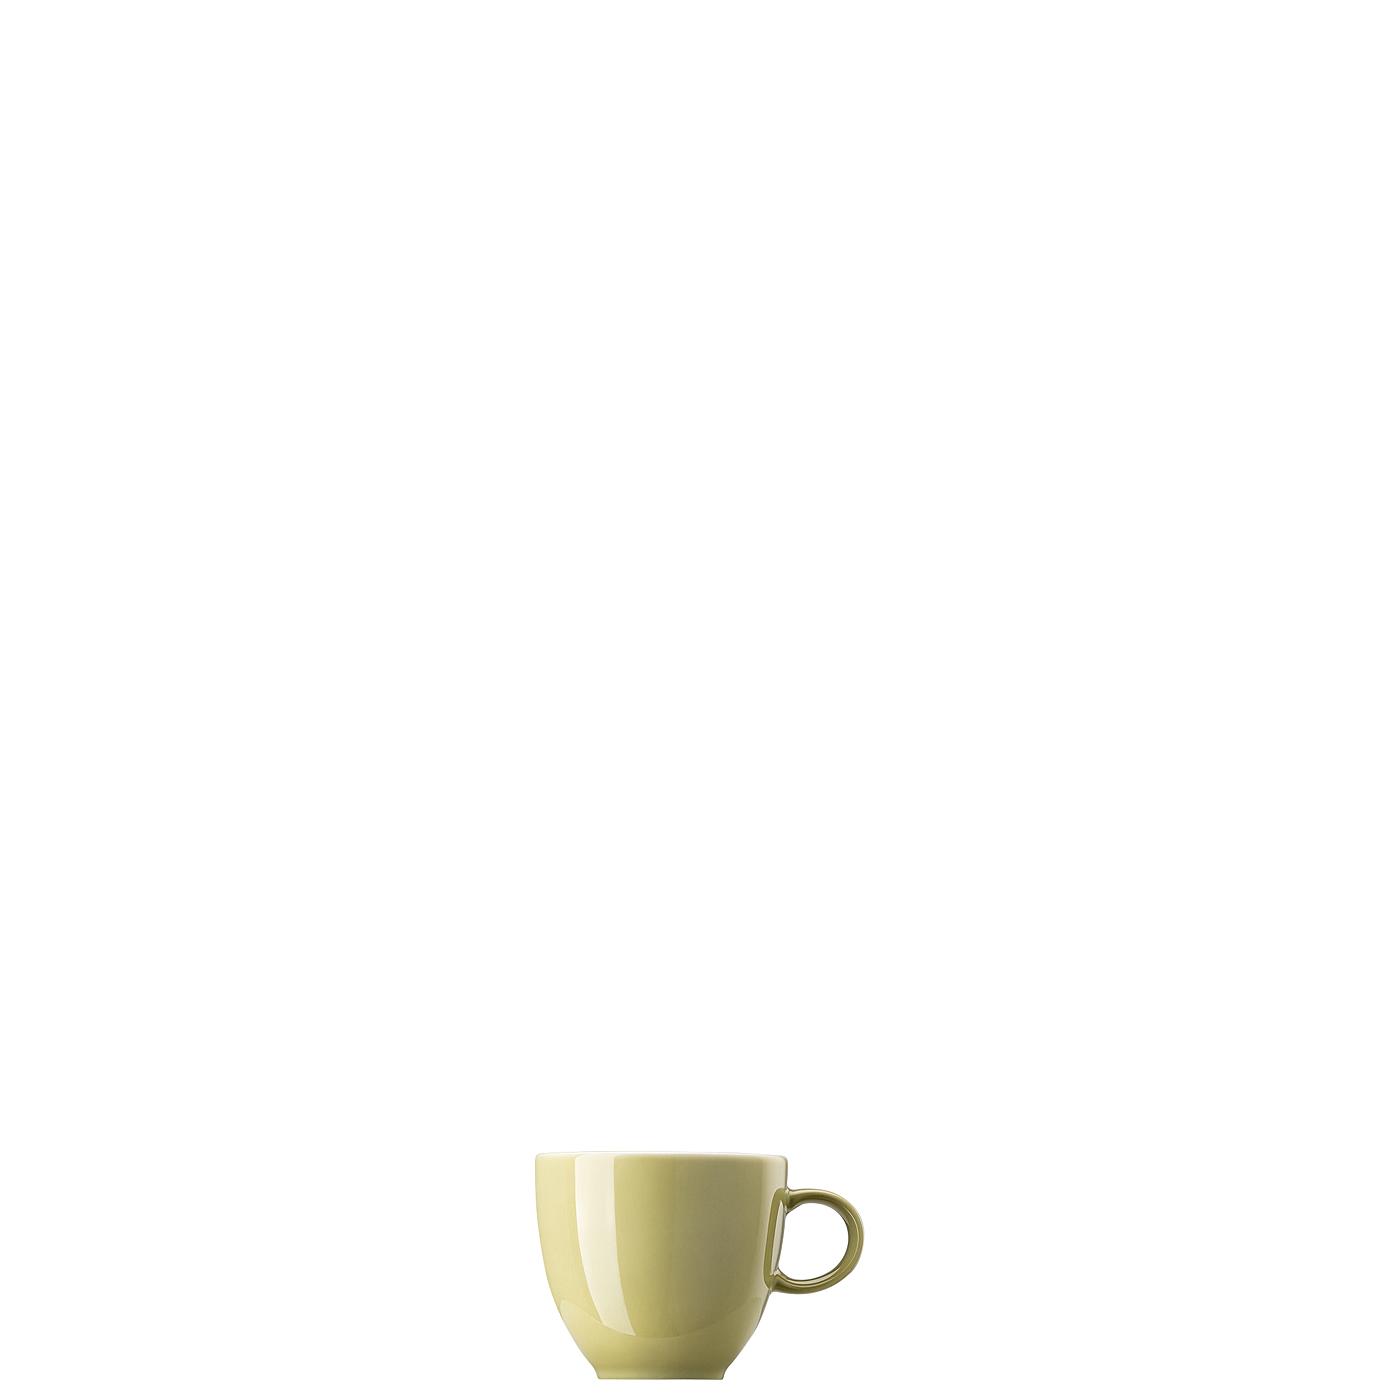 Espresso-/Mokka-Obertasse Sunny Day Avocado Green Thomas Porzellan